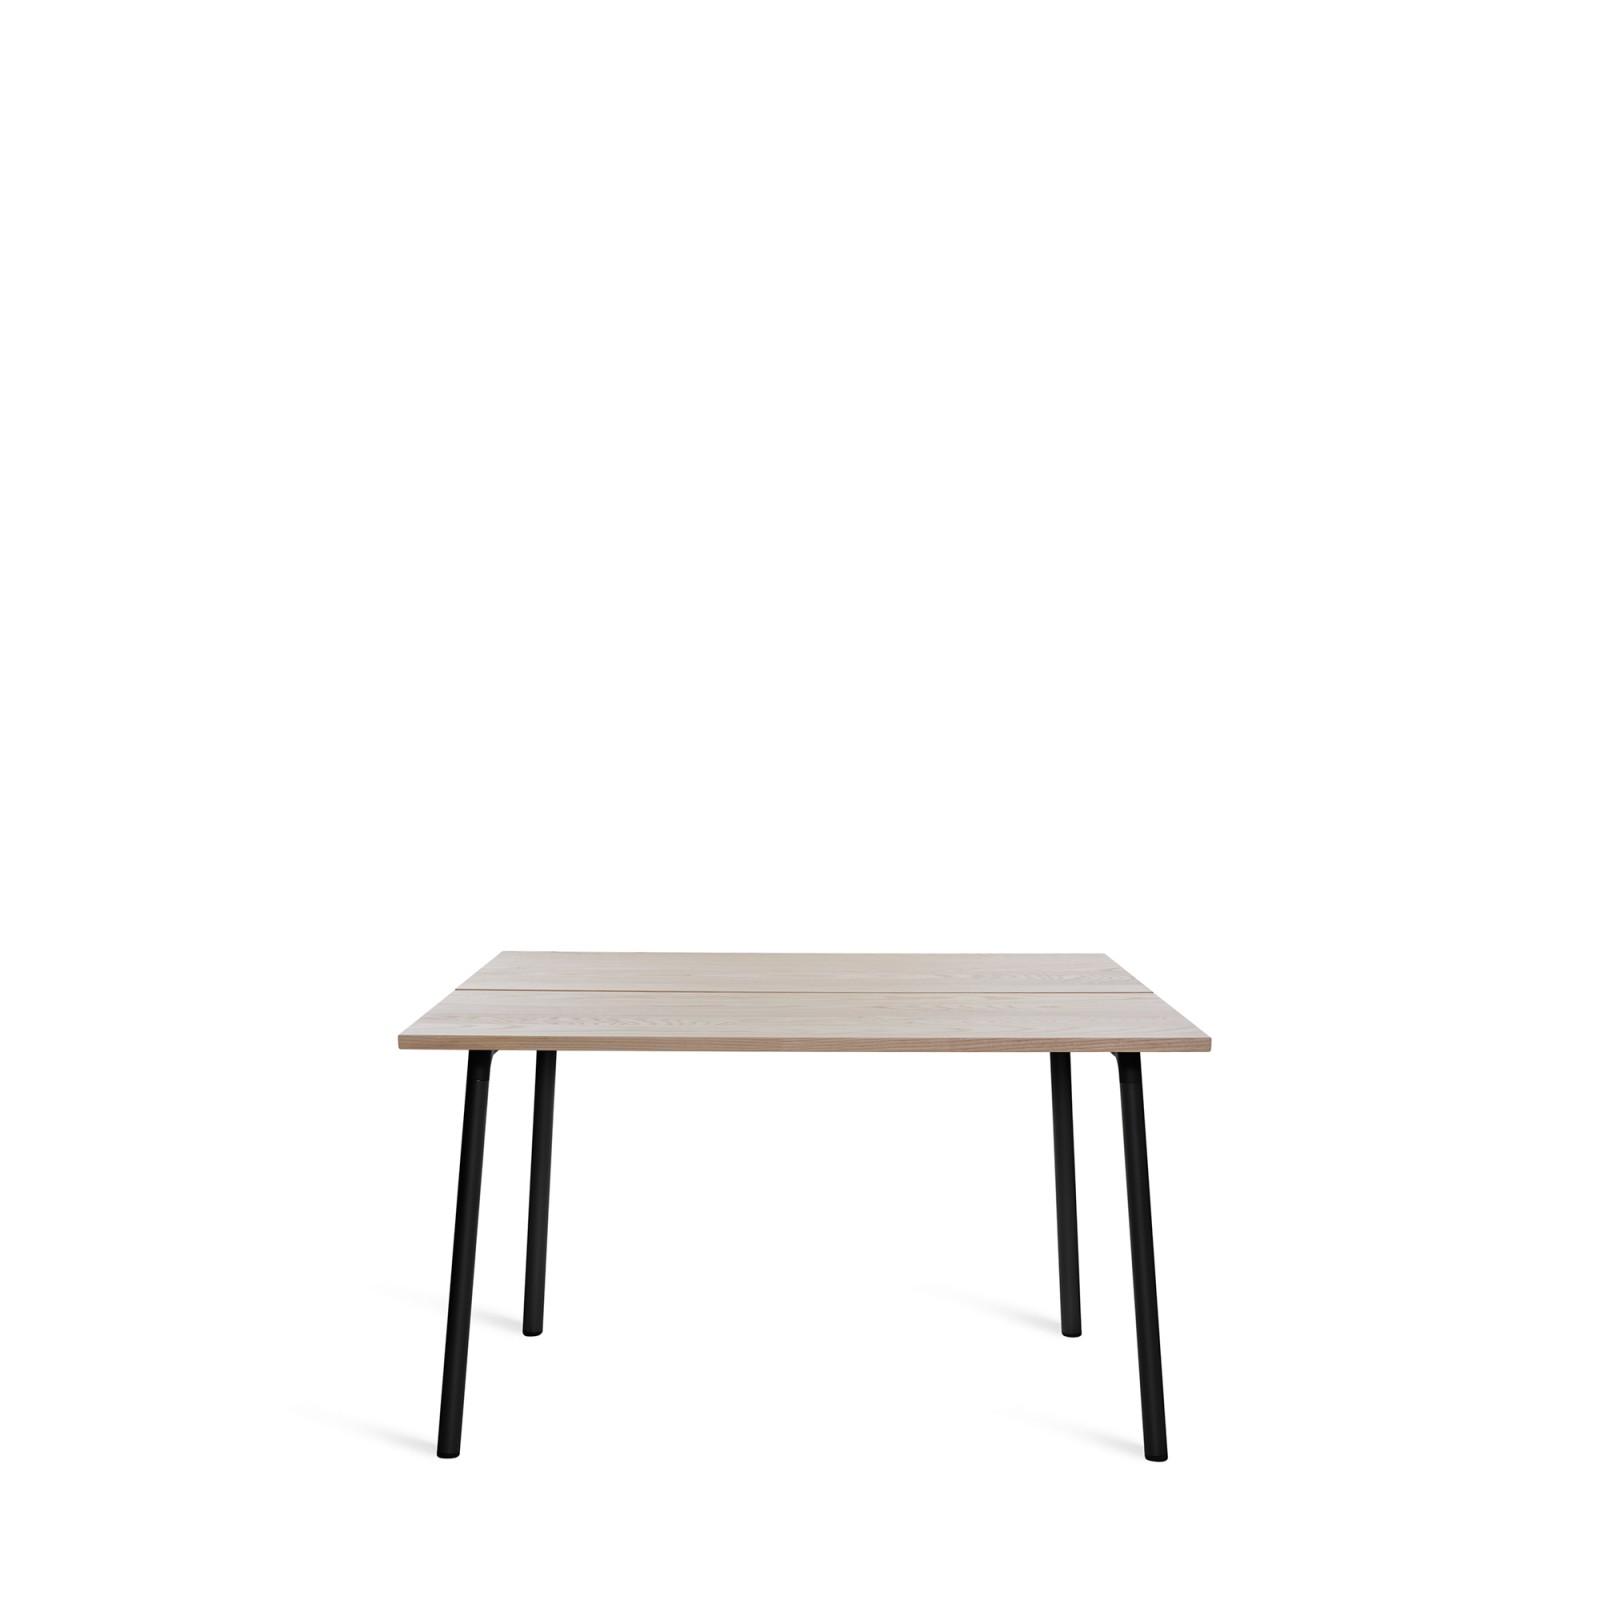 Run Dining Table 122cm, Black, Ash Top